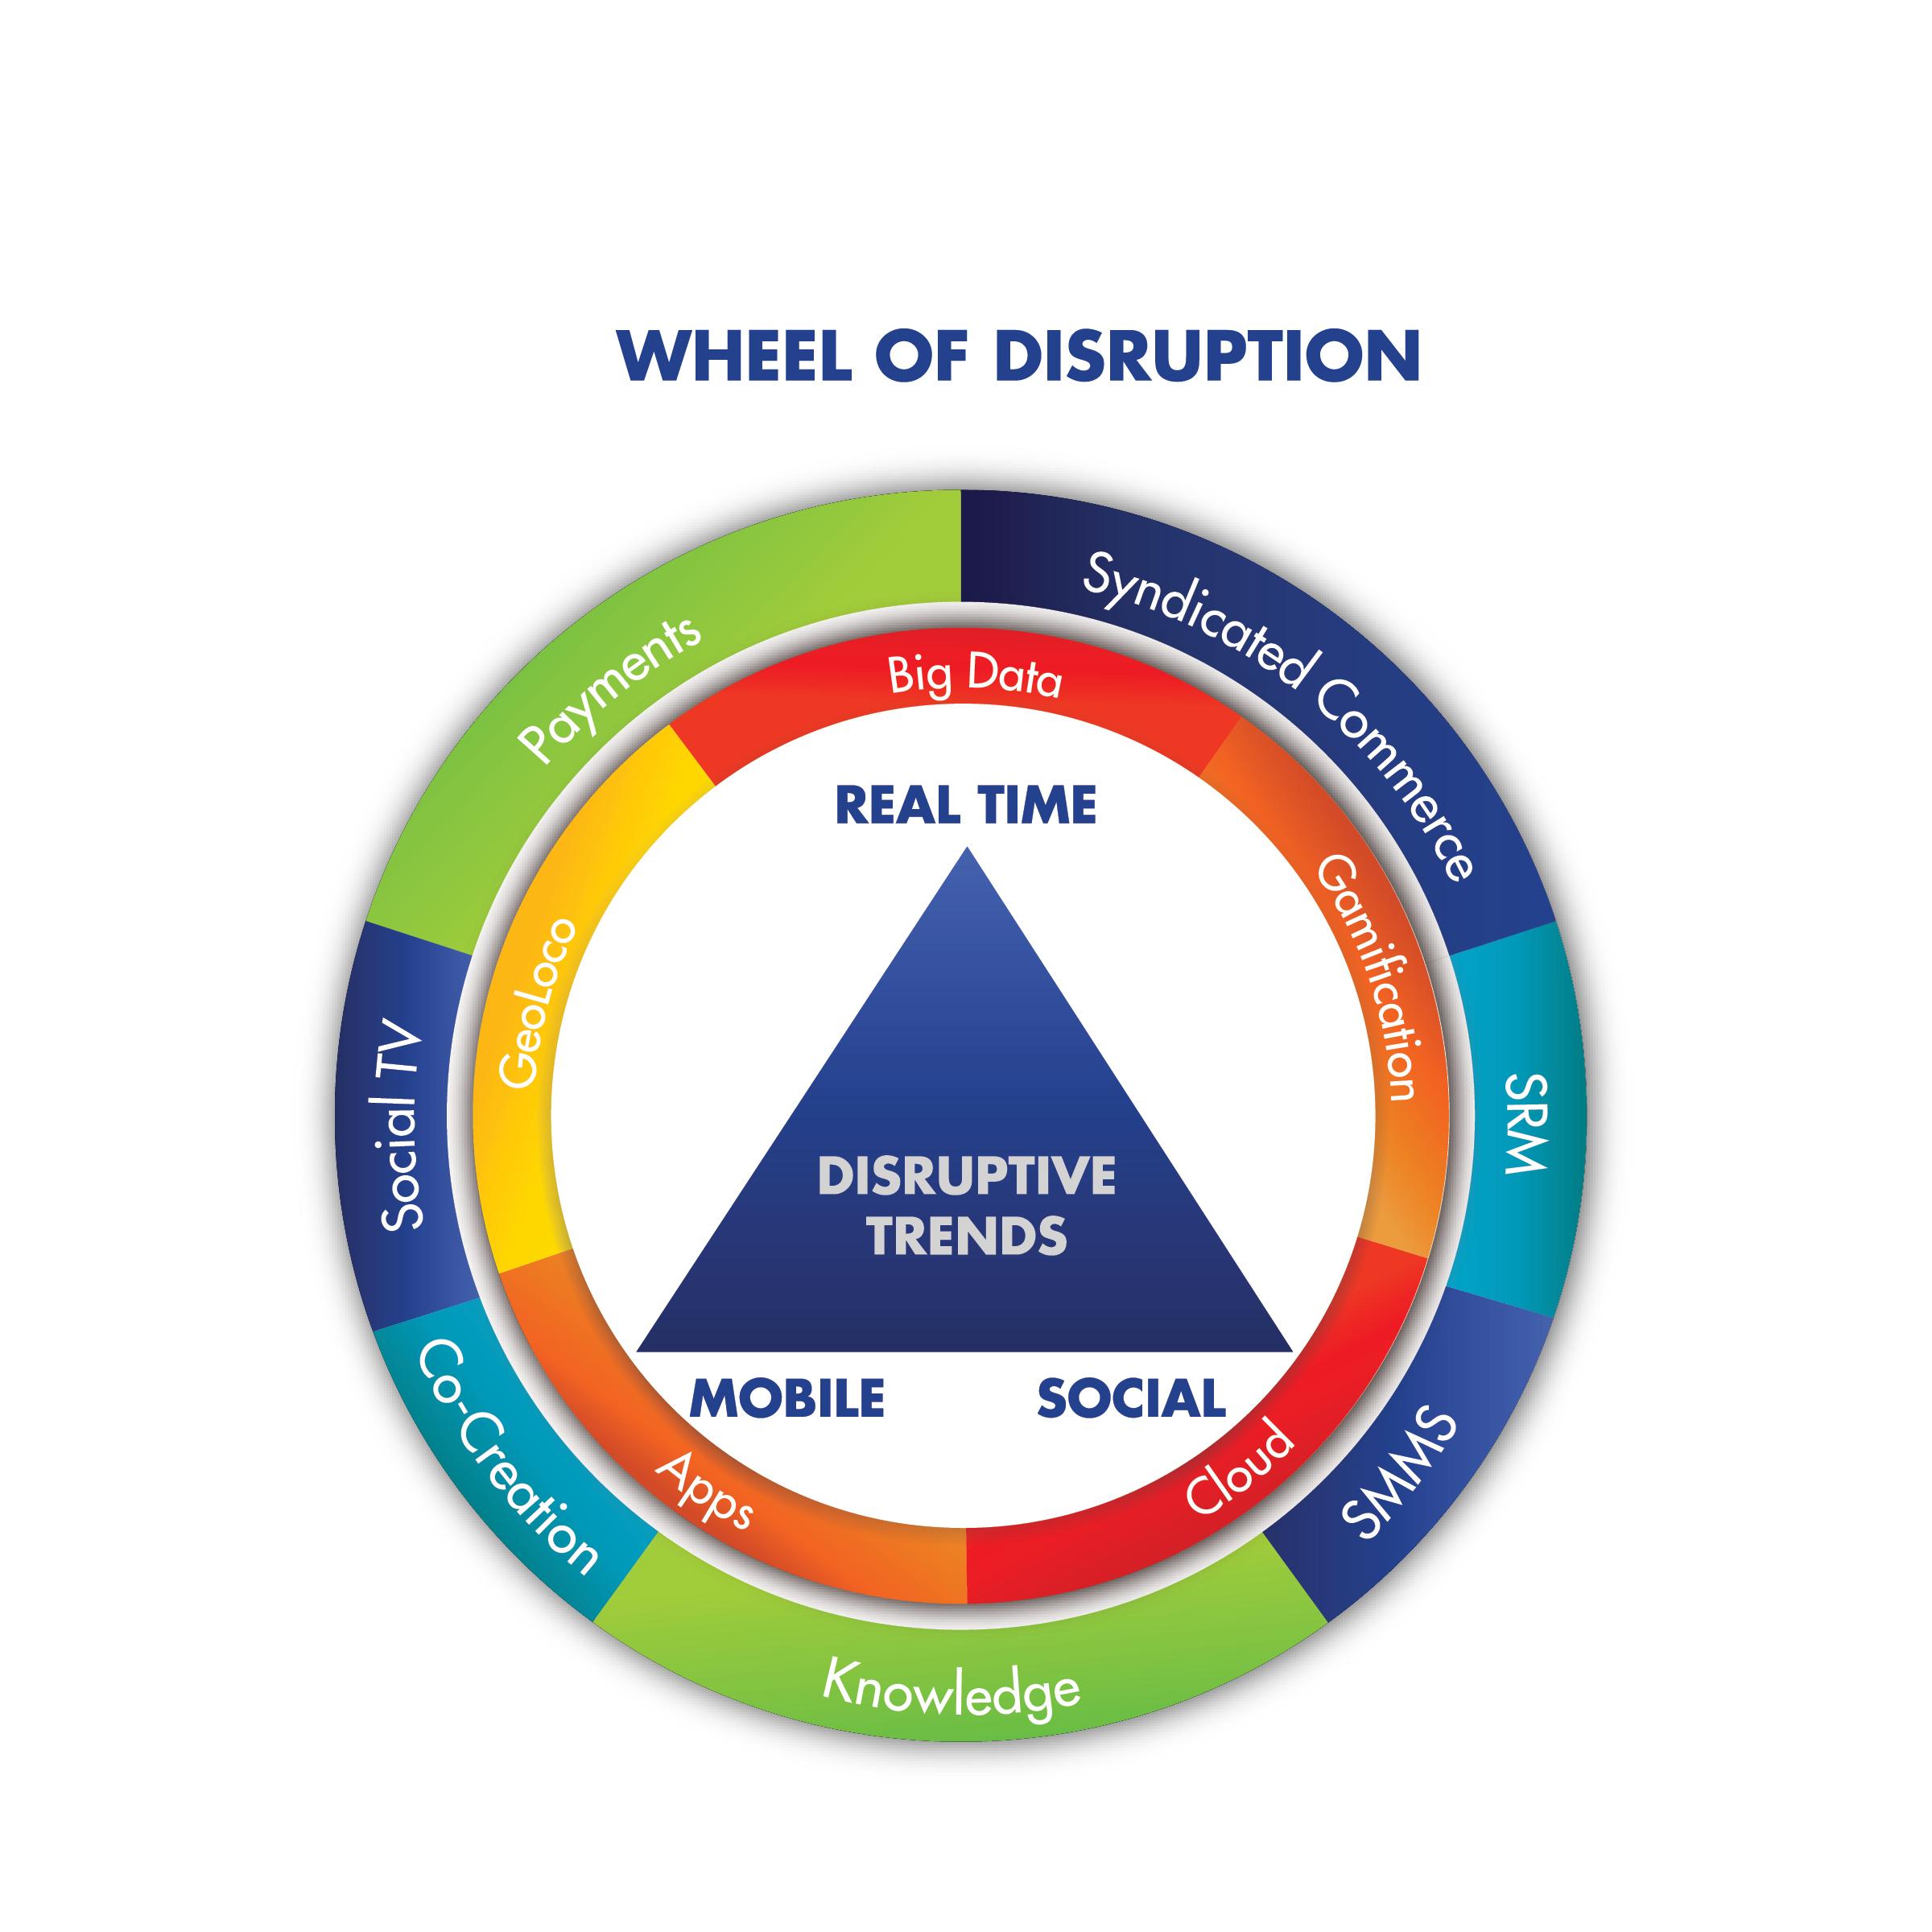 brian solis wheels of disruption